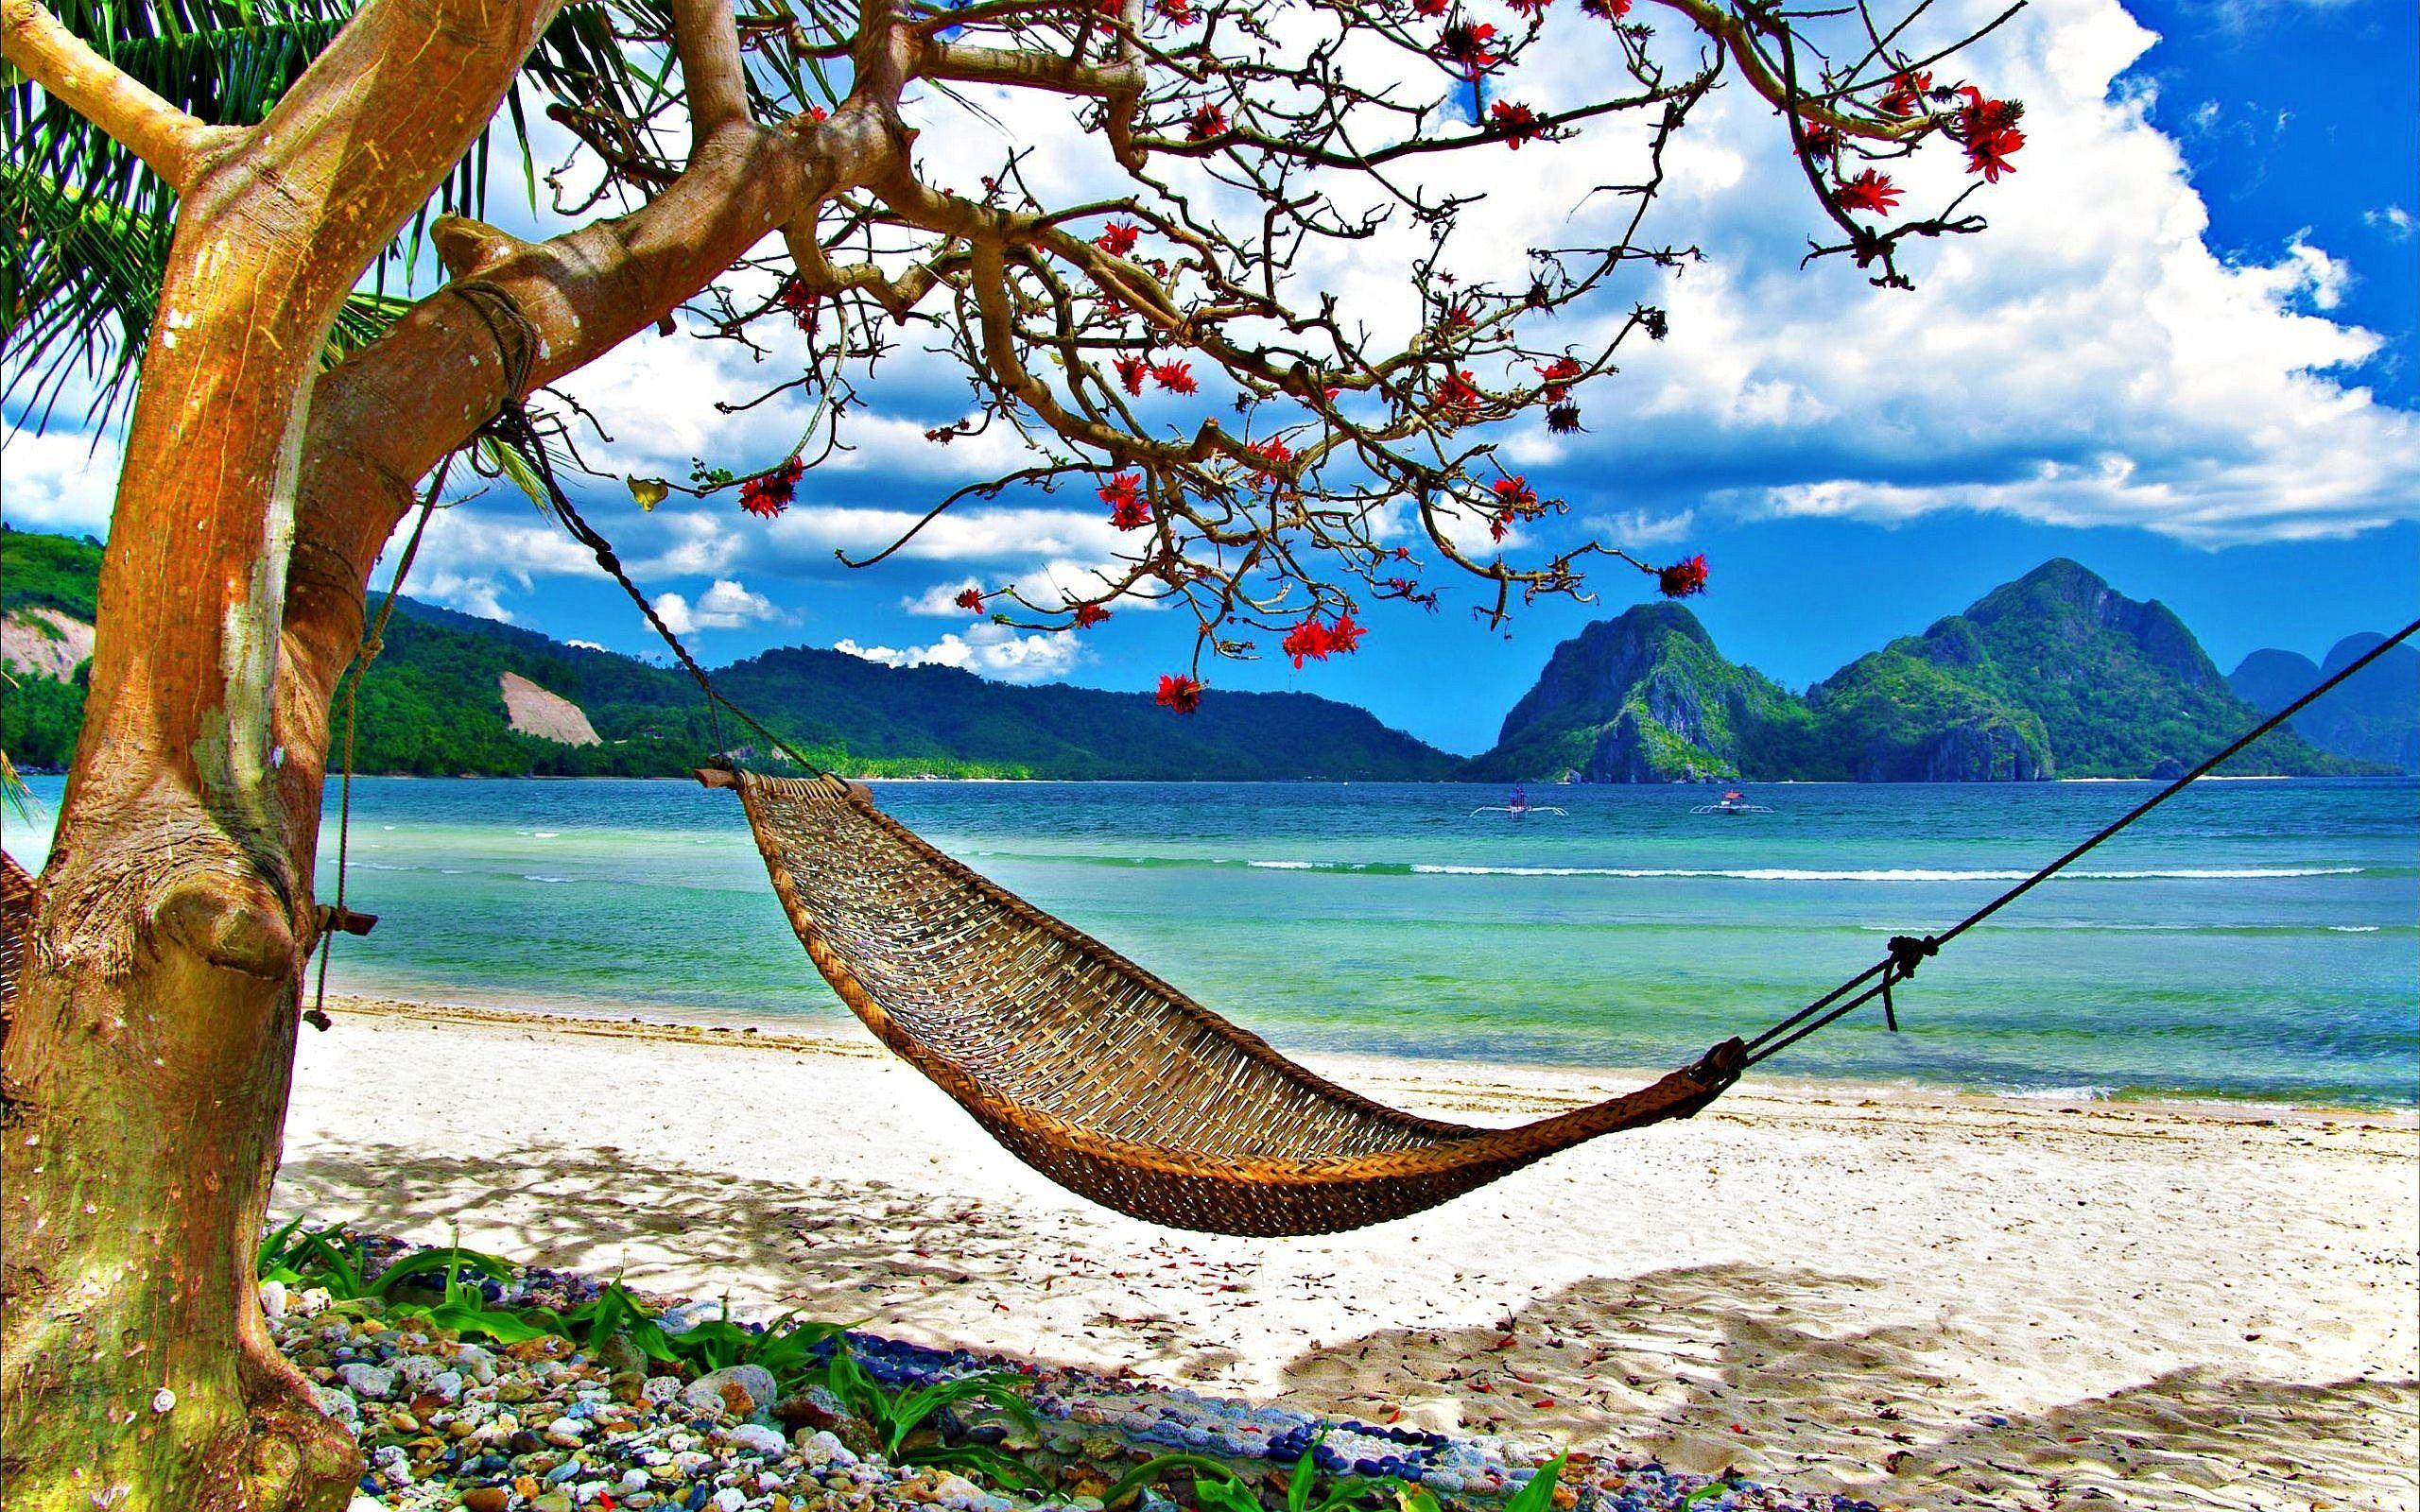 hammock photography   hammock beach wallpapers pictures photos images hammock photography   hammock beach wallpapers pictures photos      rh   pinterest